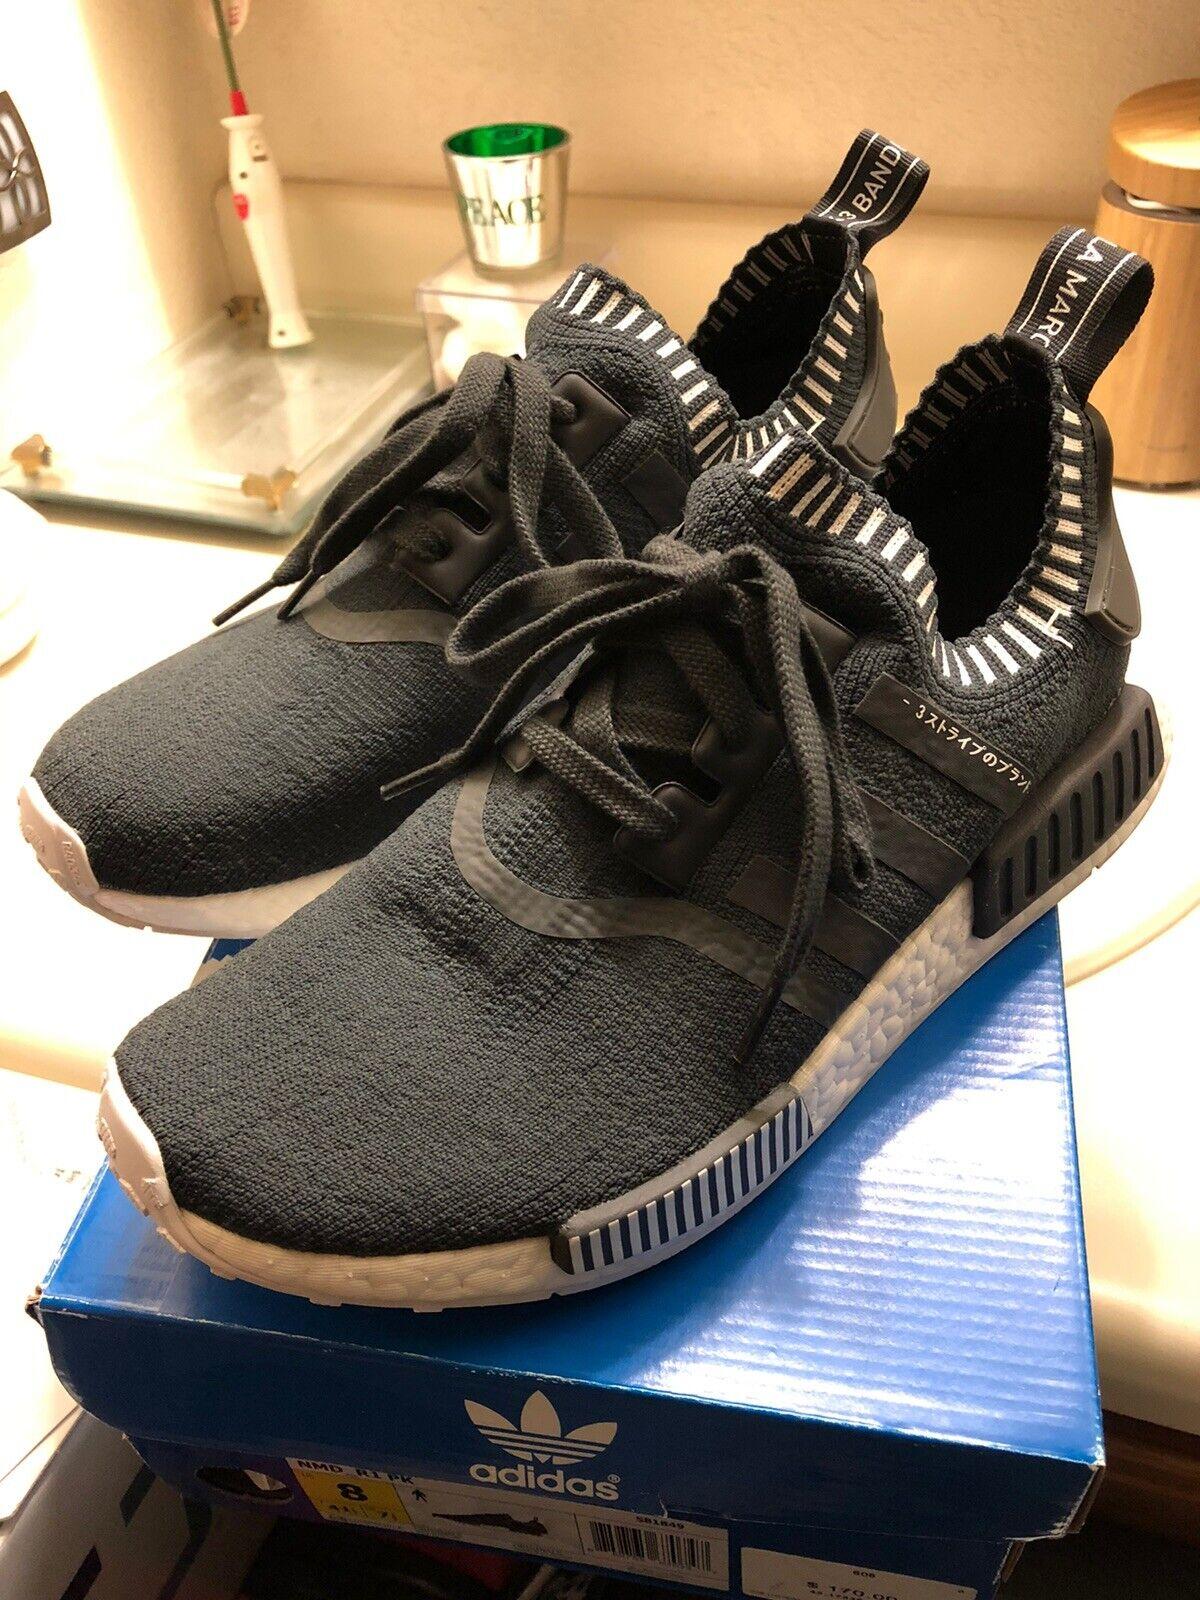 Adidas Nmd R1 Japan Boost Dark Grey Og Primeknit Uk 12 Us 12 5